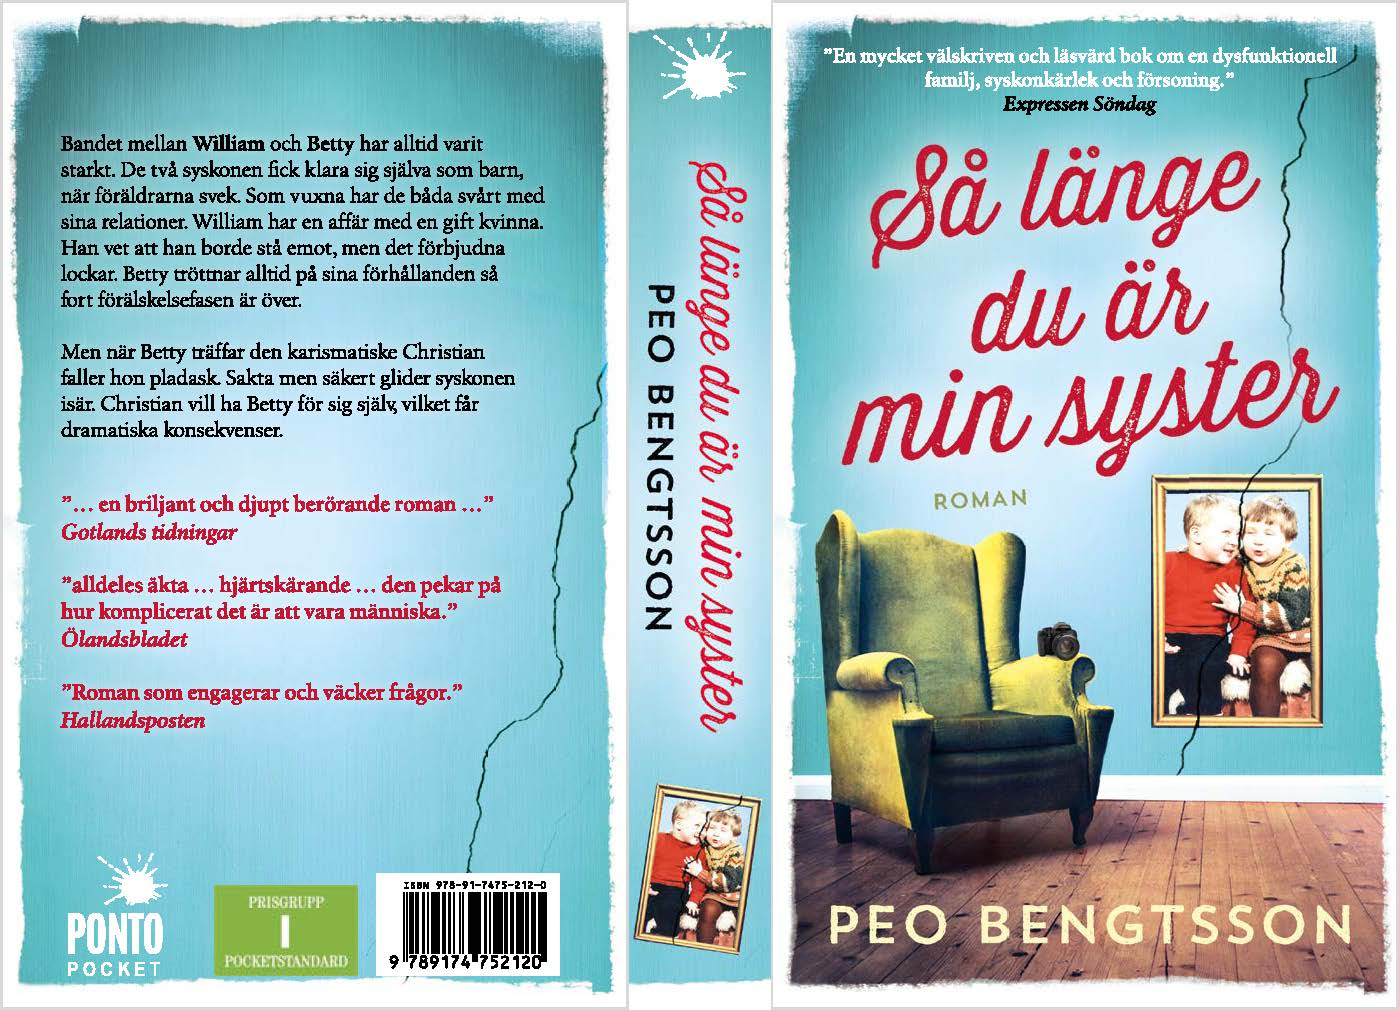 Peo Bengtsson 2015